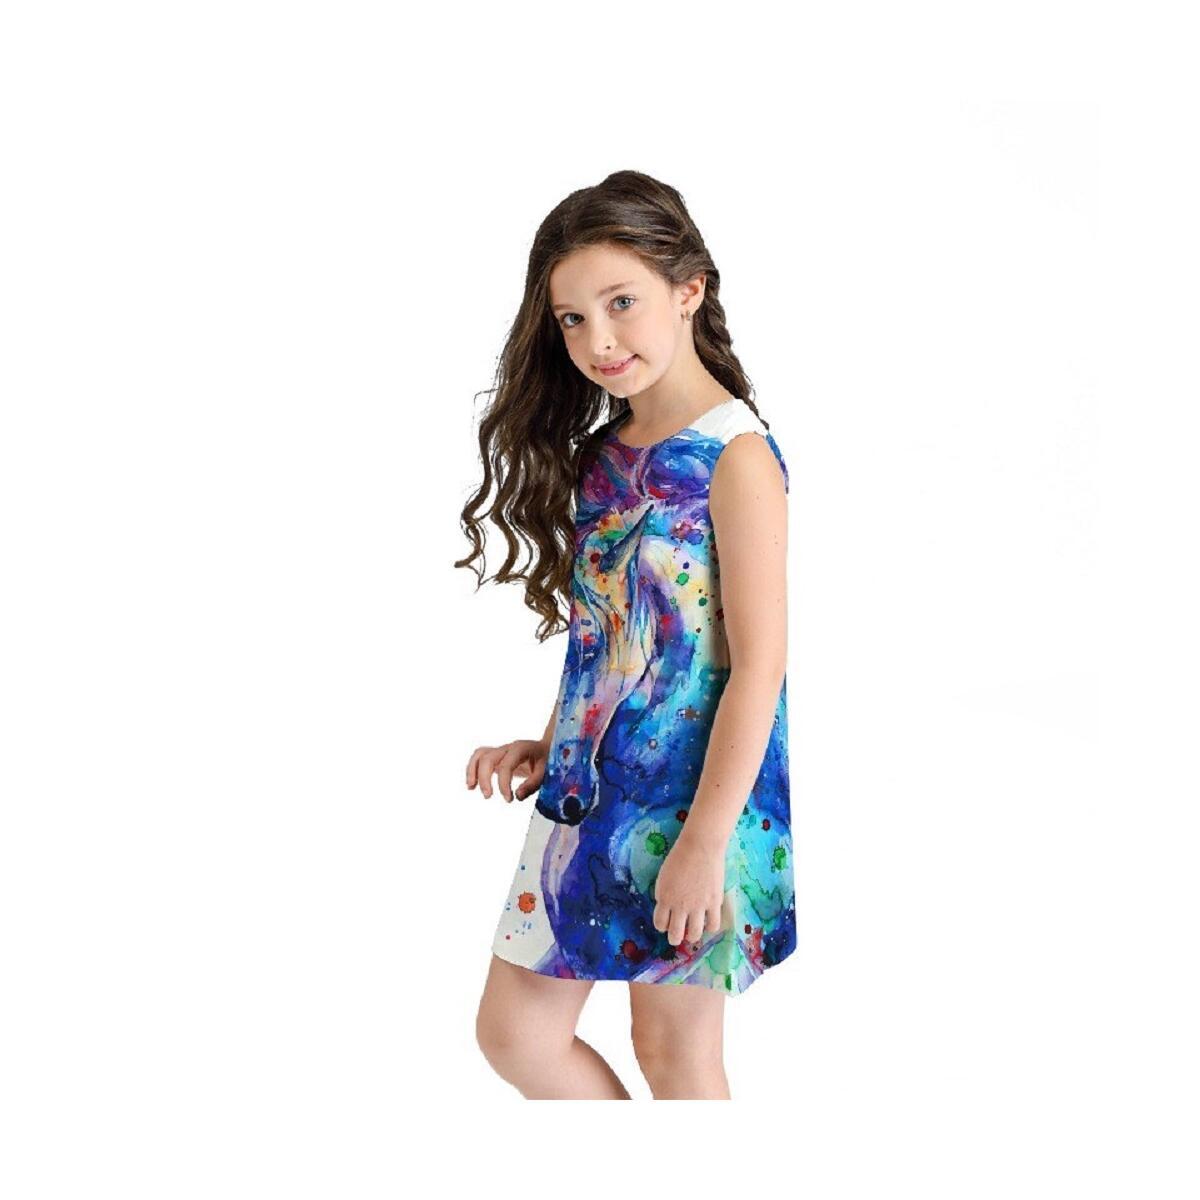 Summer Unicorn Dress for 6 7 8 9 10 11 12 Years Old Girls Sleeveless Dress(medium)